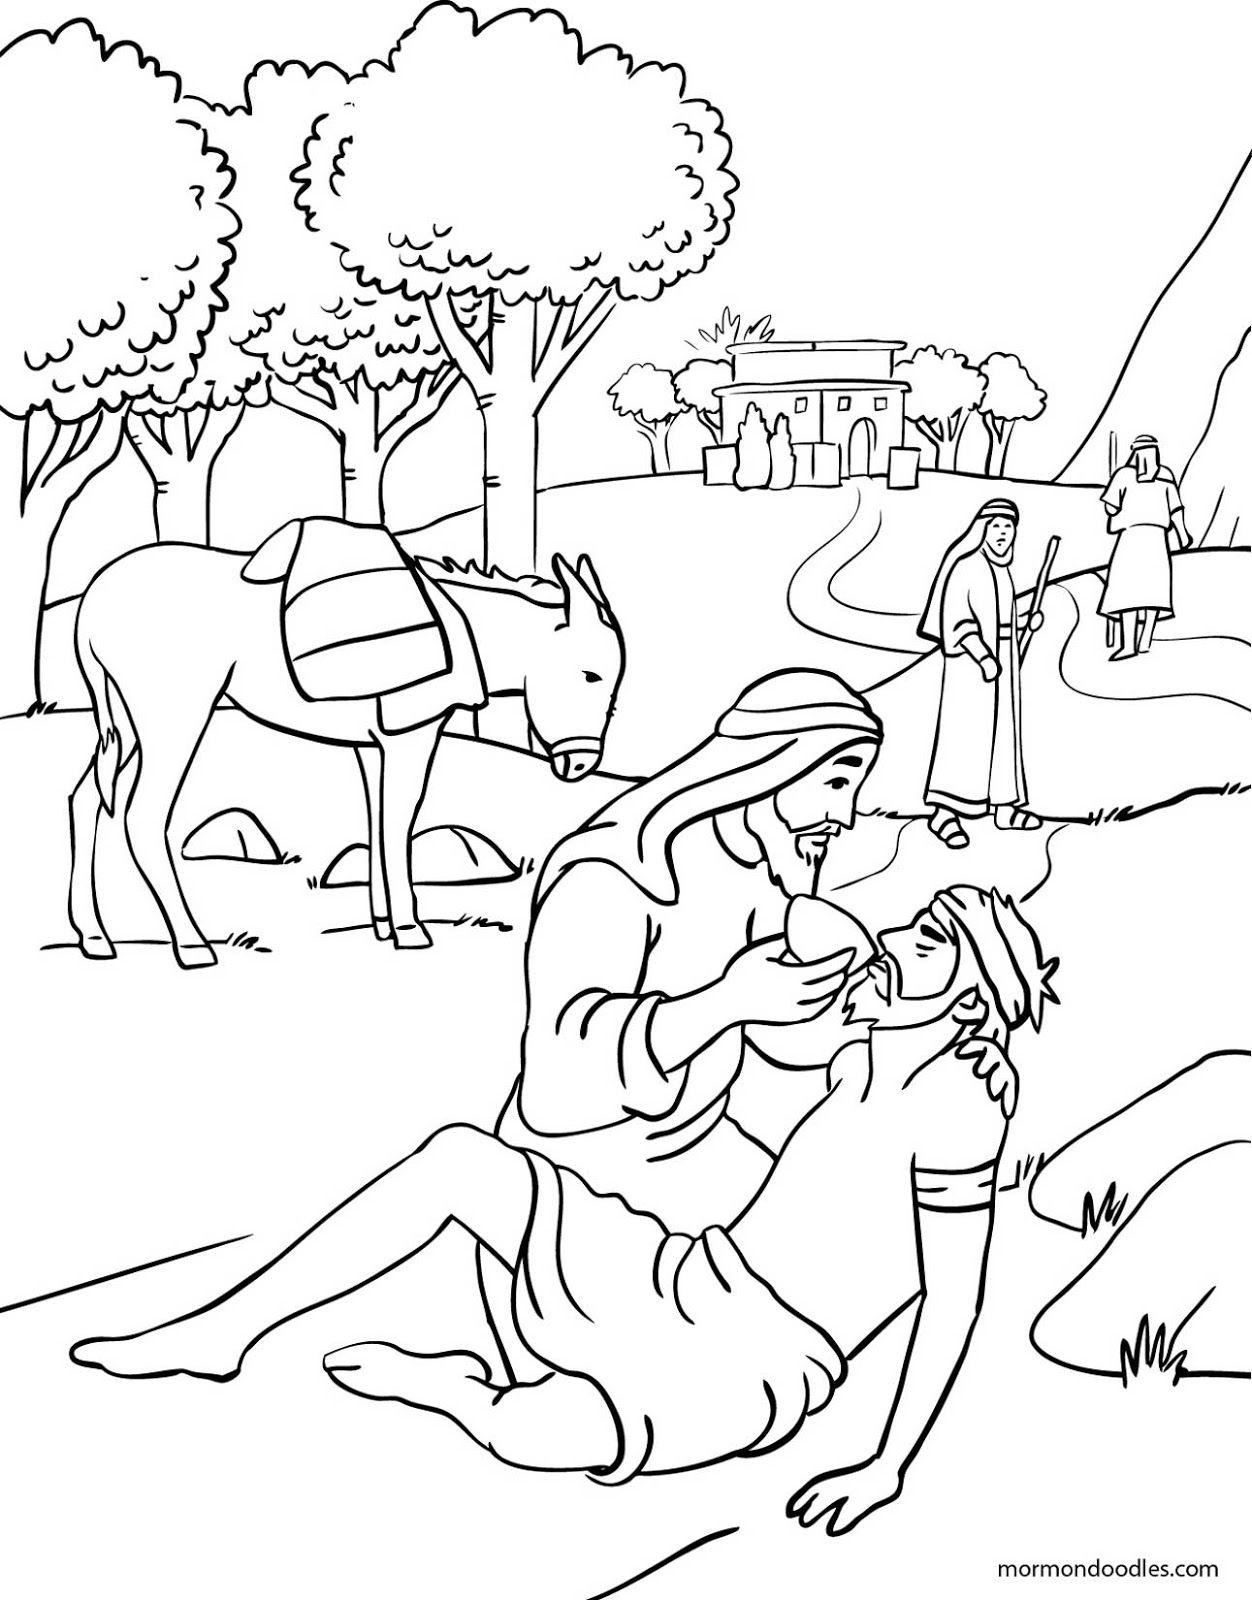 The Good Samaritan Coloring Pages : samaritan, coloring, pages, Mormon, Doodles:, Samaritan, Coloring, Sunday, School, Pages,, Bible,, Bible, Pages